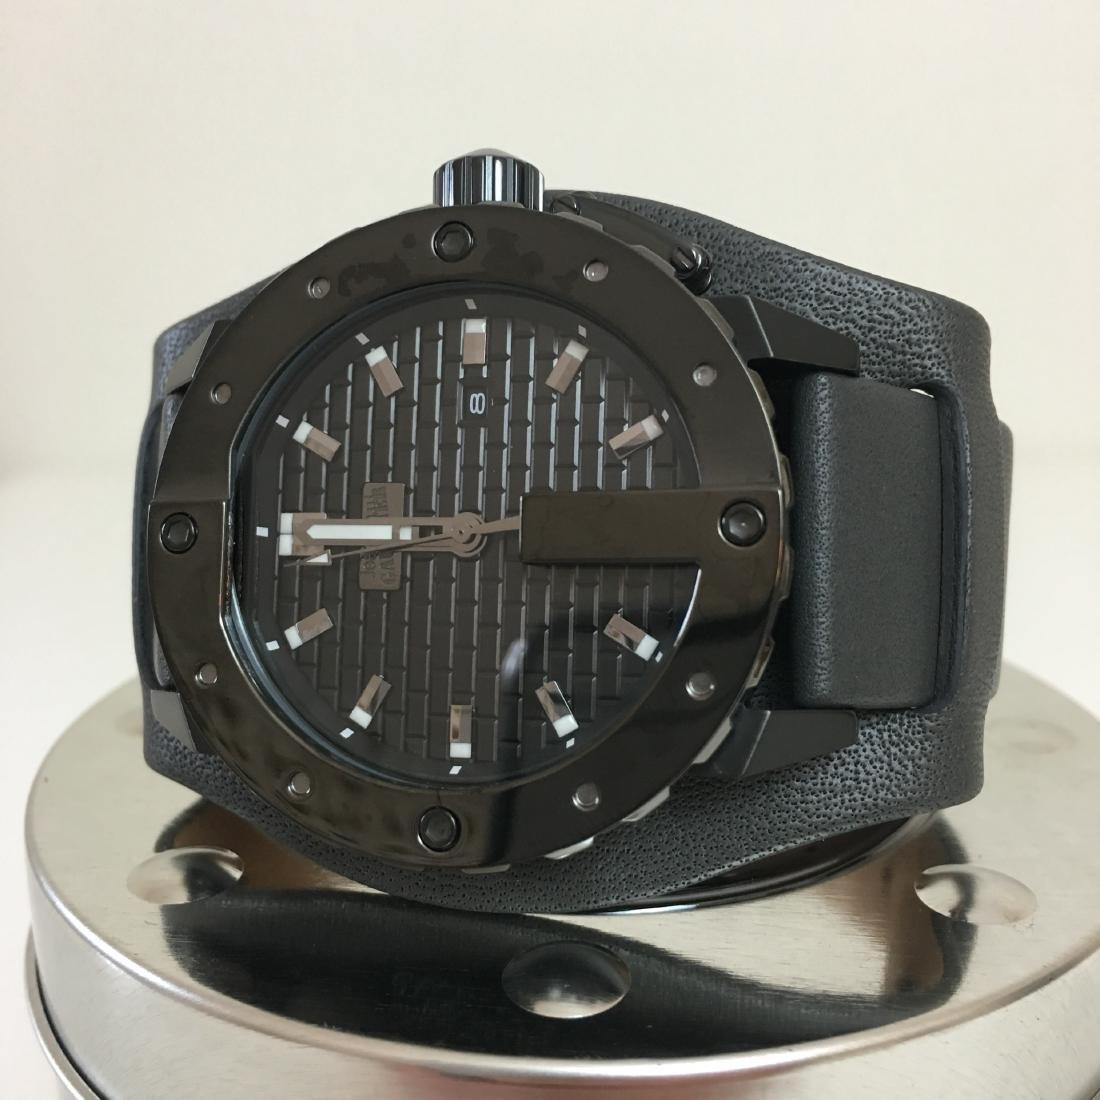 Jean Paul Gaultier – Men's Designer Wrist Watch